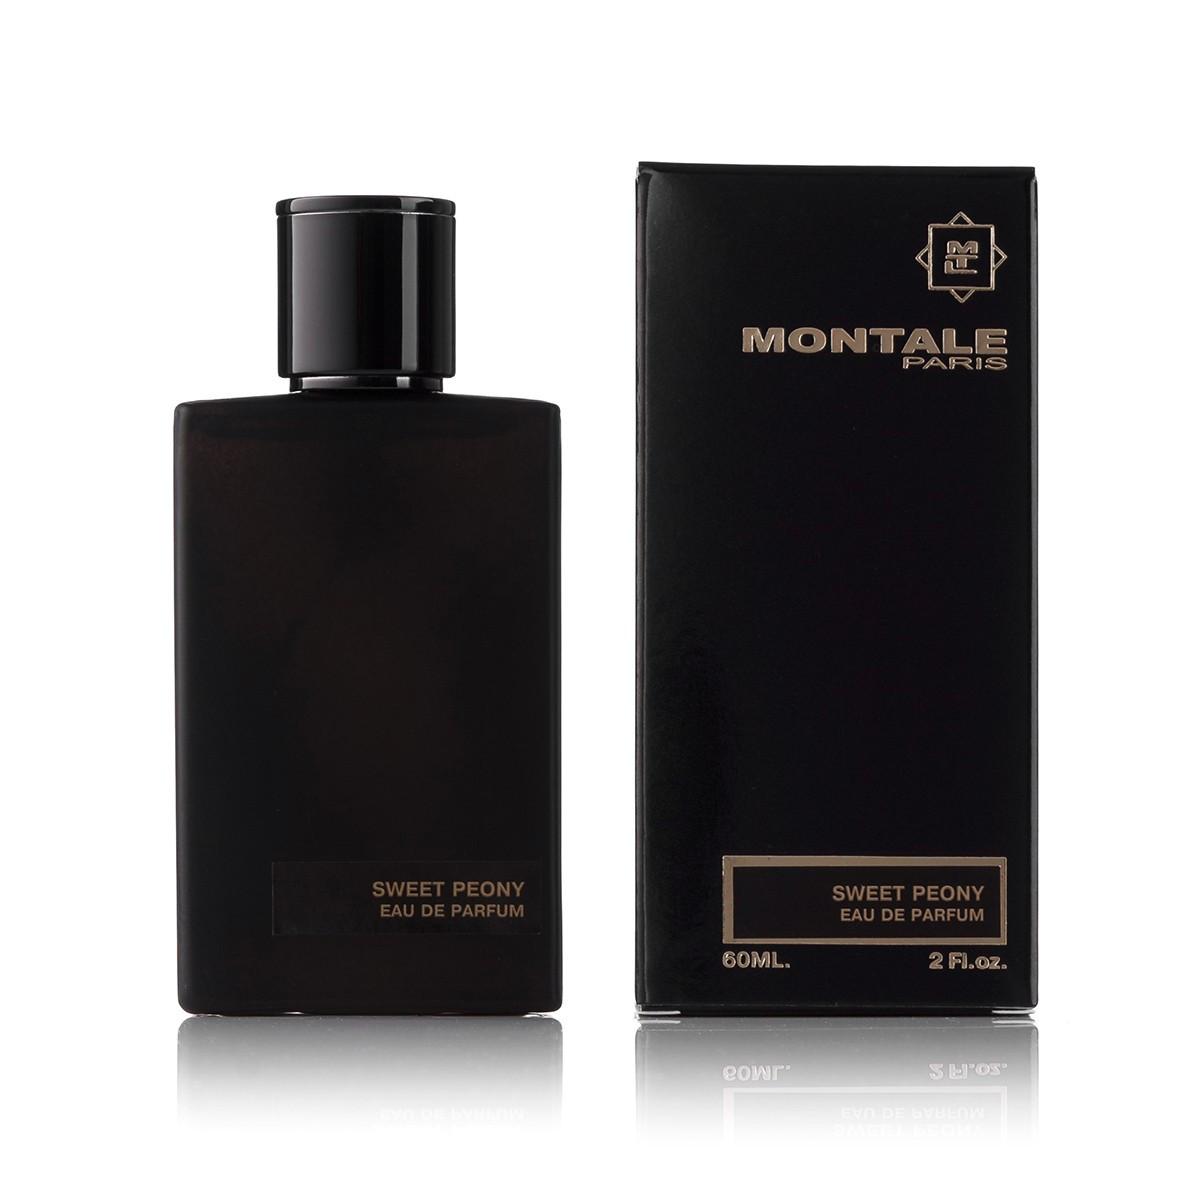 Montale Sweet Peony (Black) - Travel Spray 60ml